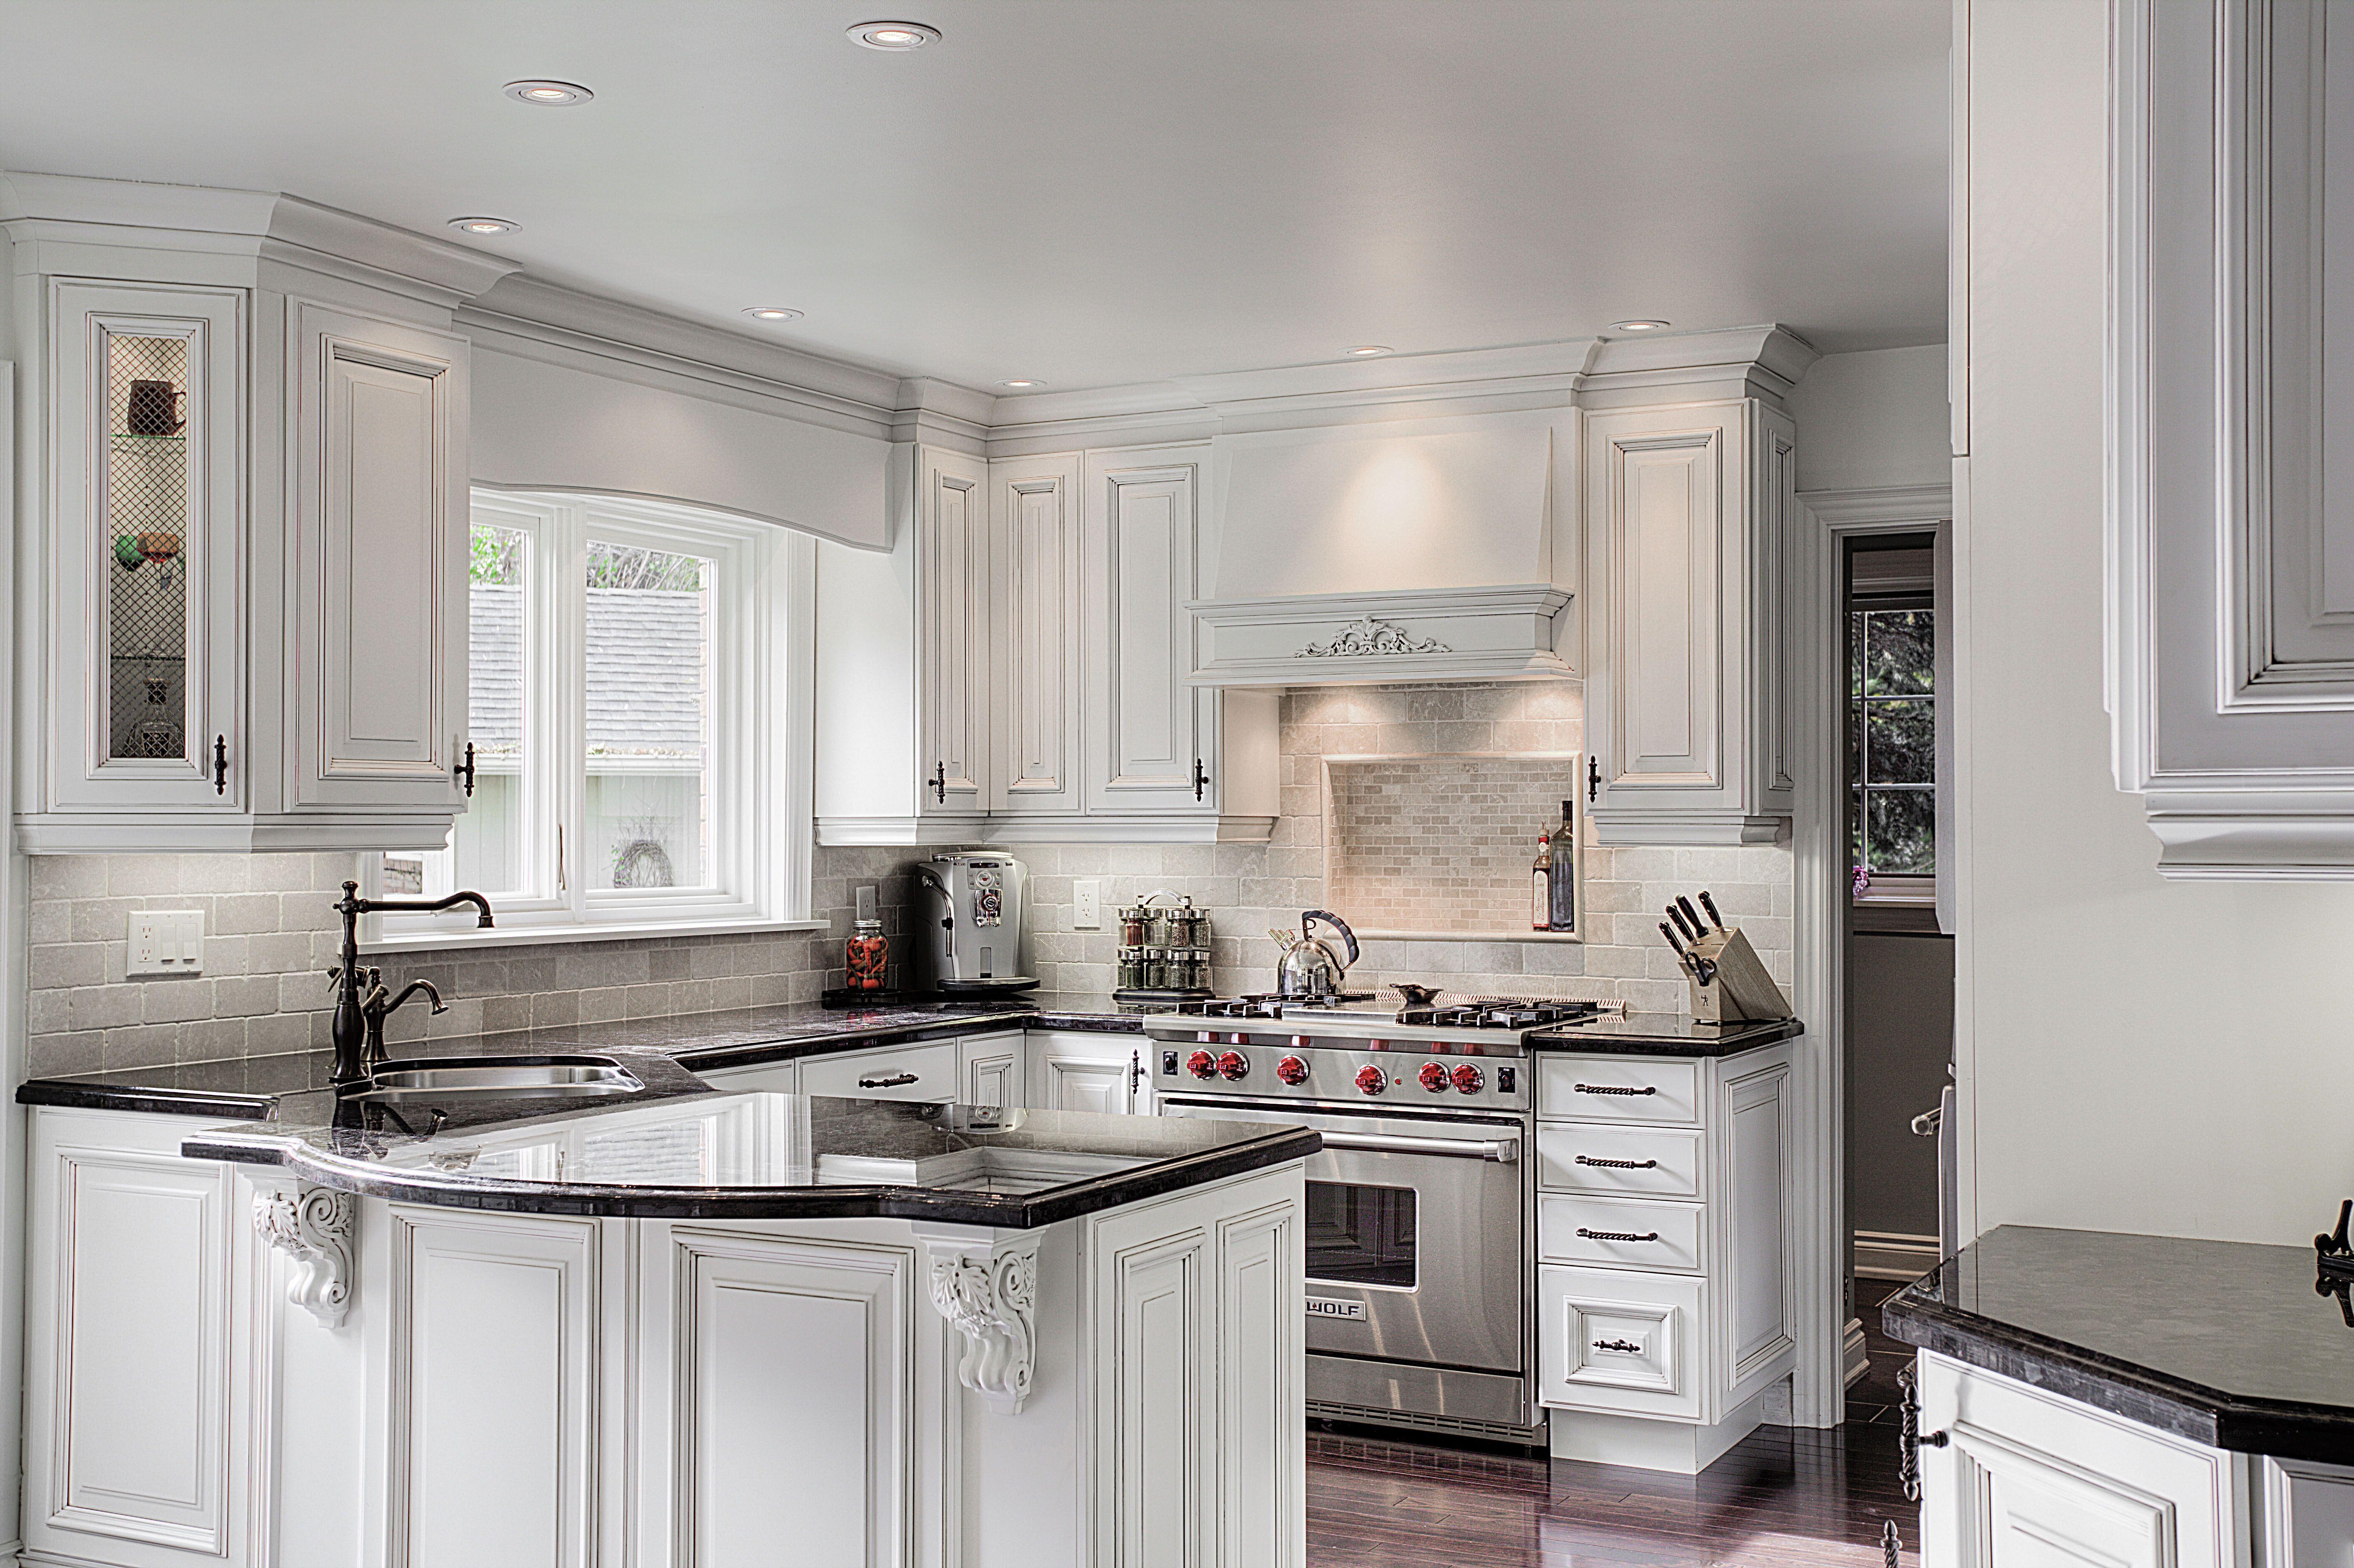 Kitchen Design Cabinetry Simple Kitchen Design Kitchen And Bath Remodeling Kitchen Design